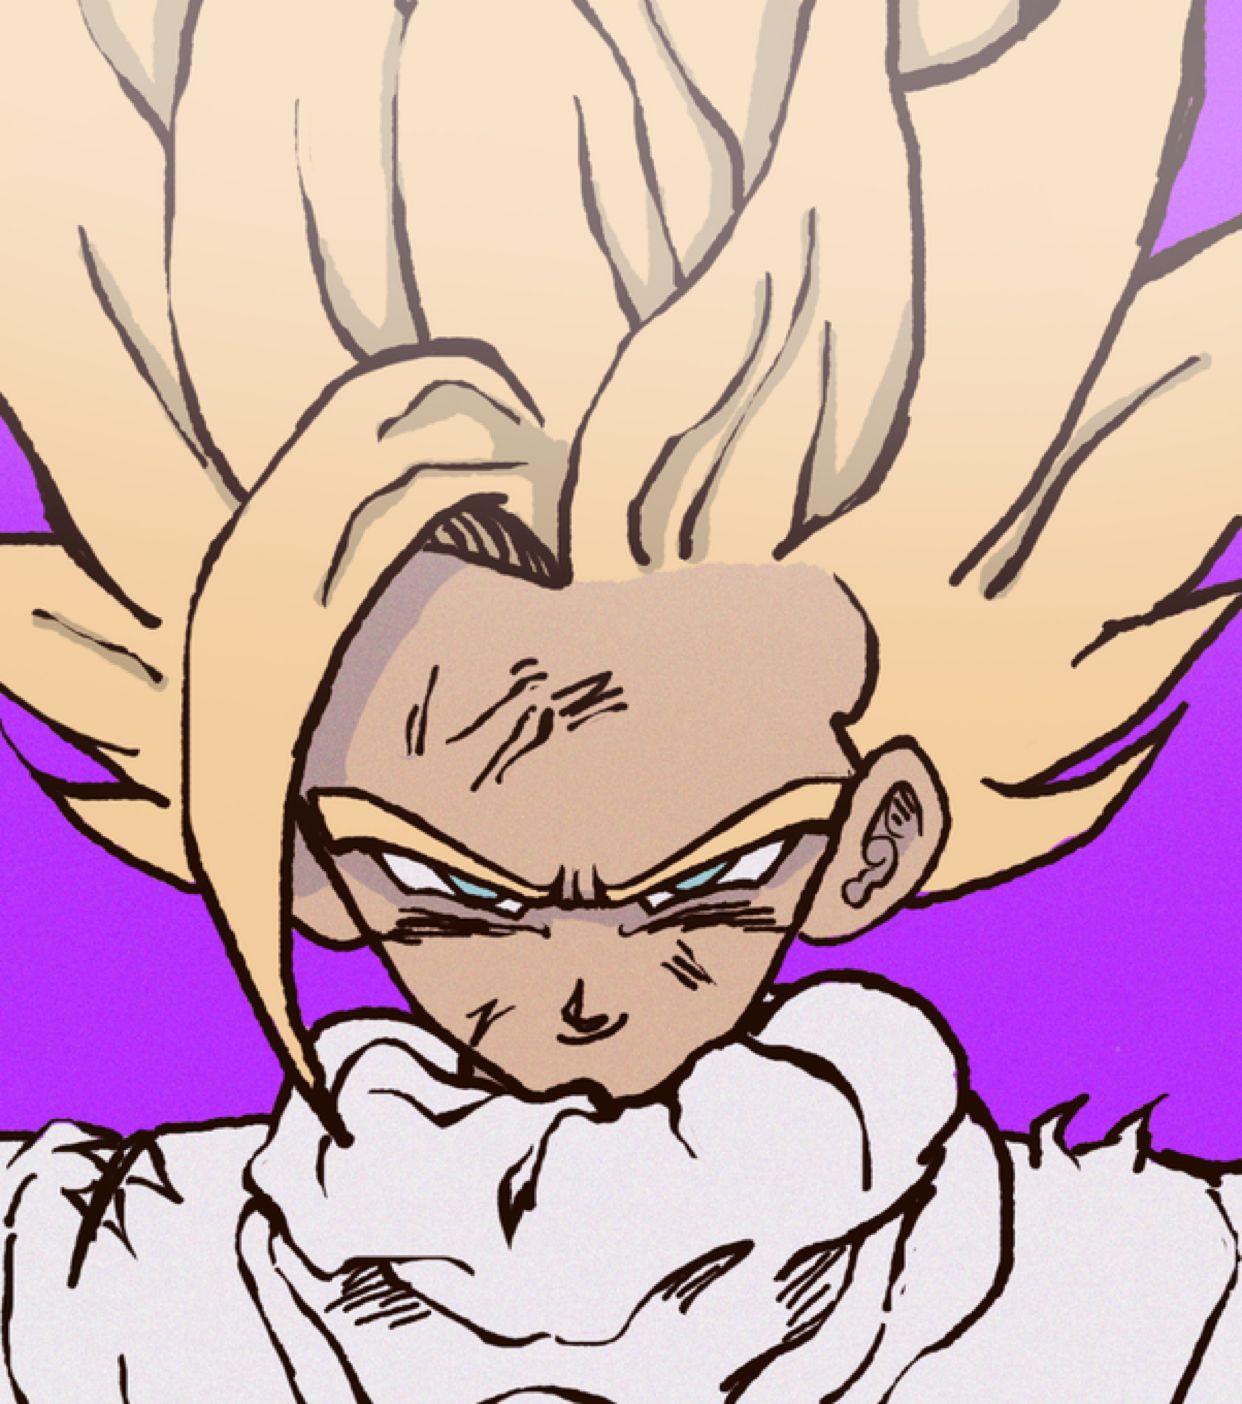 Pin by BrandonLittle85 . on DBZ | Anime character design ...